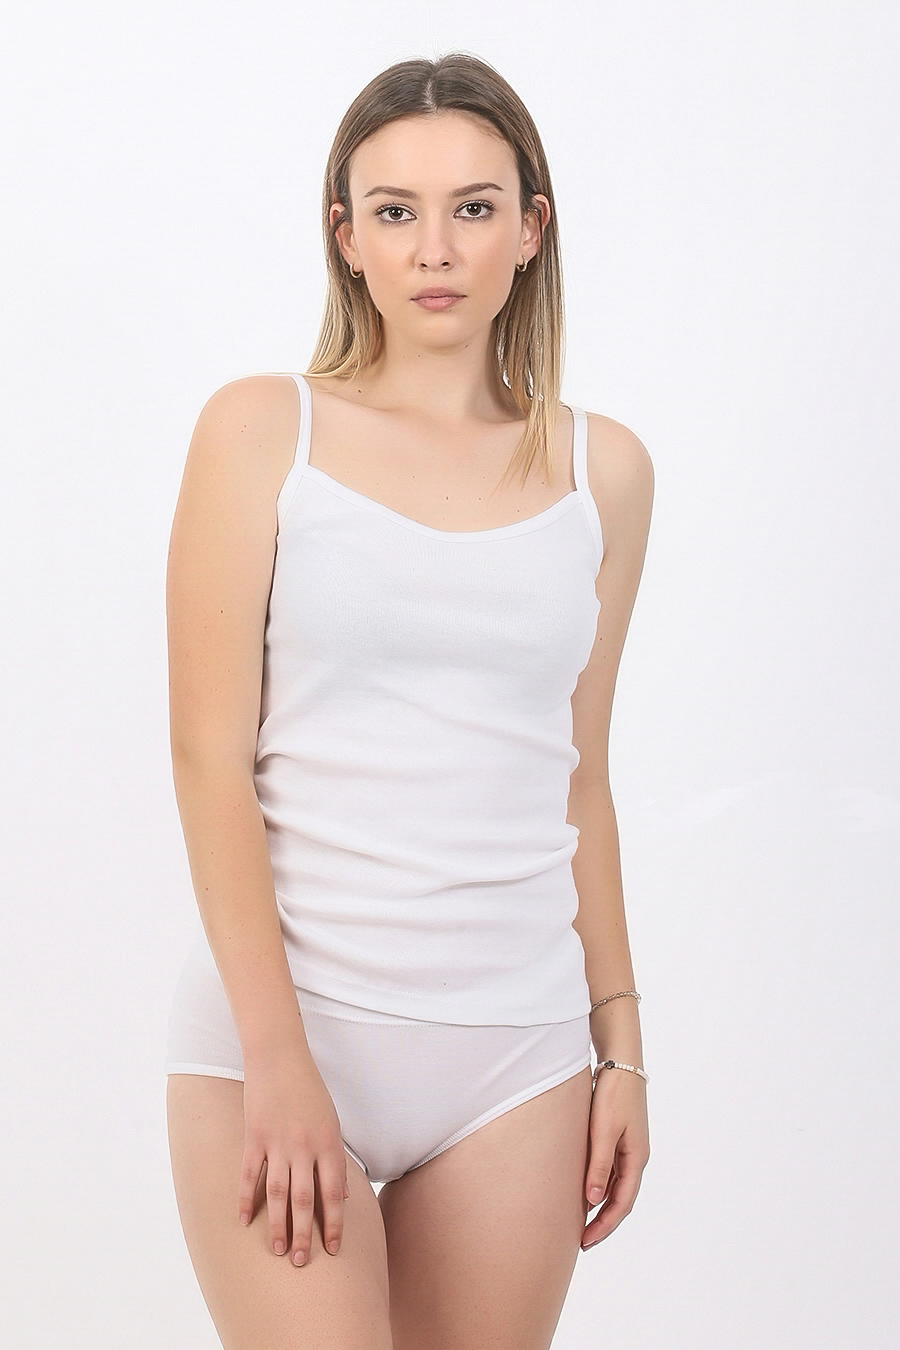 Zenska majica uska bretela ART.702 (bela- gornji deo)